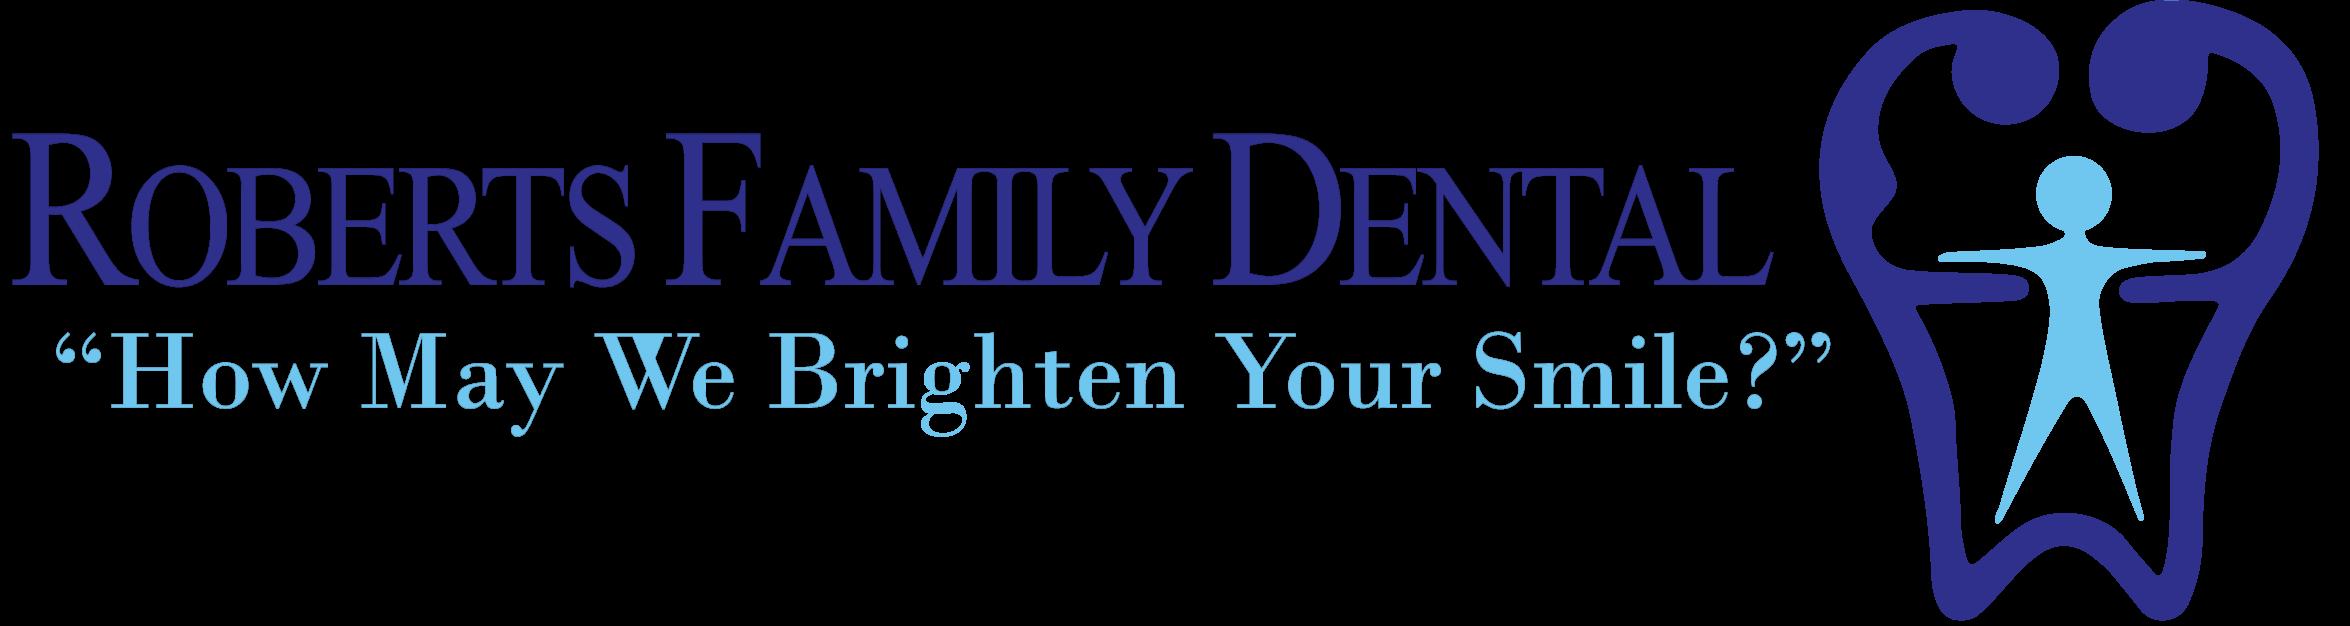 enmasse - Roberts Family Dental Logo